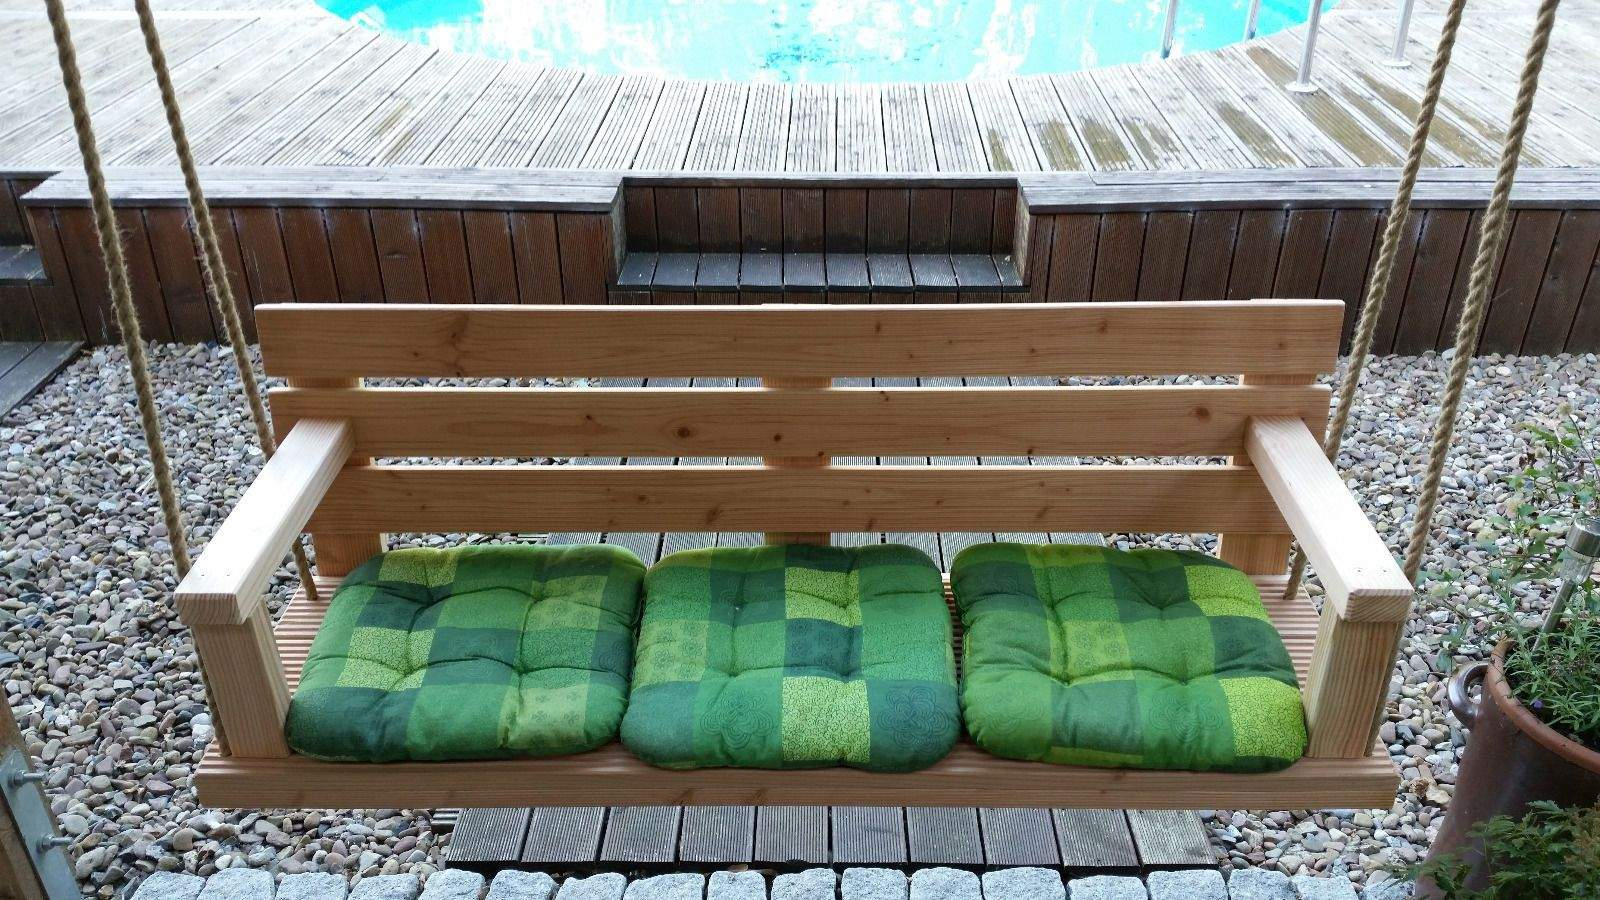 Schaukelbank Garten Luxus Hängebank Hollywoodschaukel Schaukelbank Aus Douglasie Holz